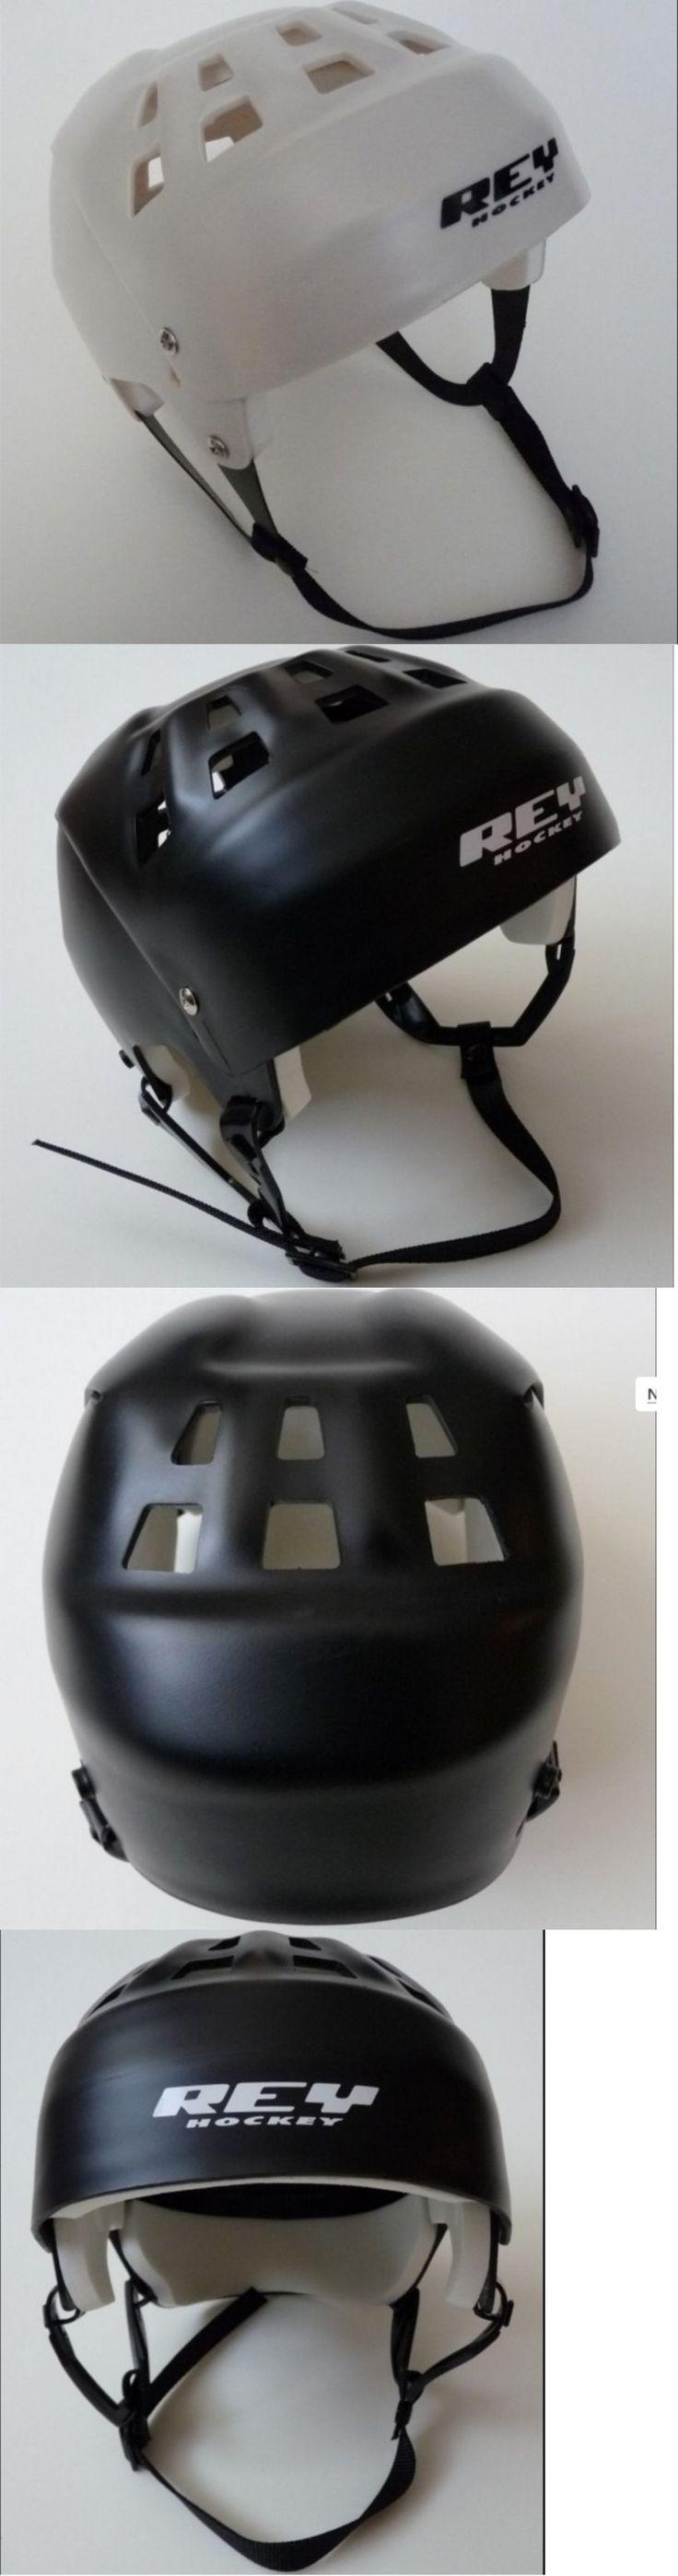 Helmets 20854: Rey Jofa-Style Street Hockey Helmet - Senior Sz White (Med Large) Adjustable -> BUY IT NOW ONLY: $69.99 on eBay!